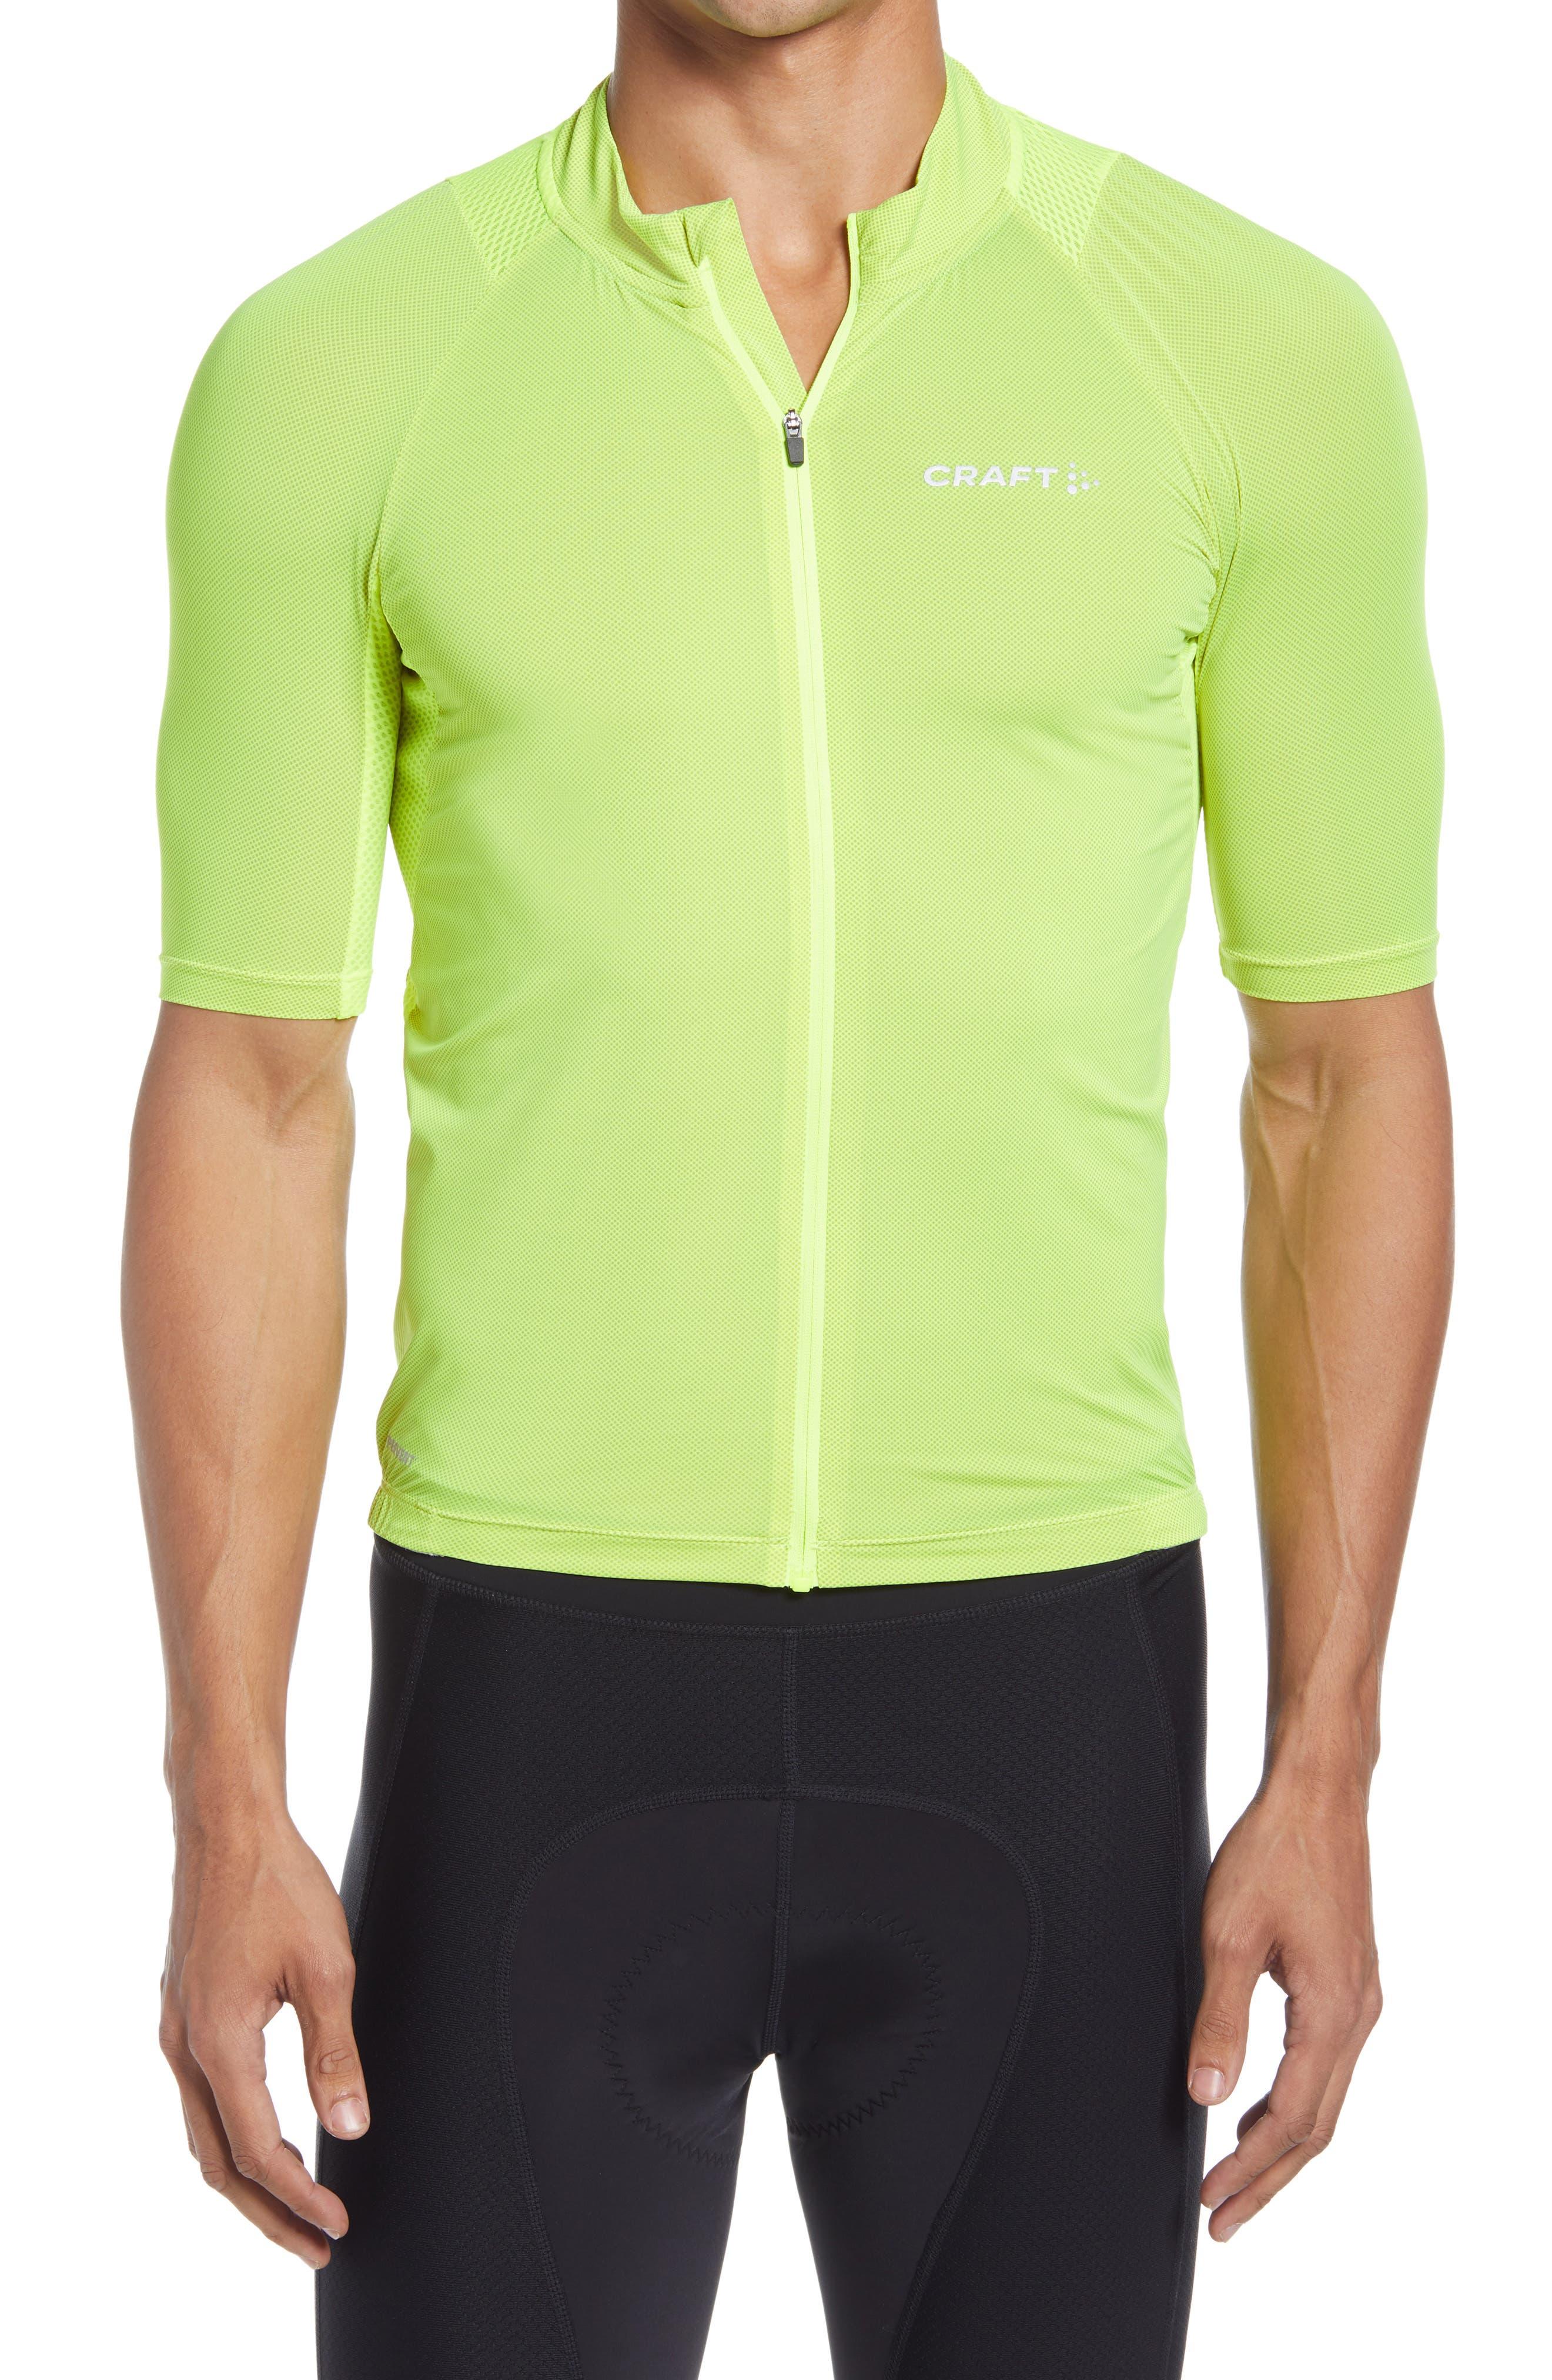 Men's Pro Endur Lumen Cycling Jersey